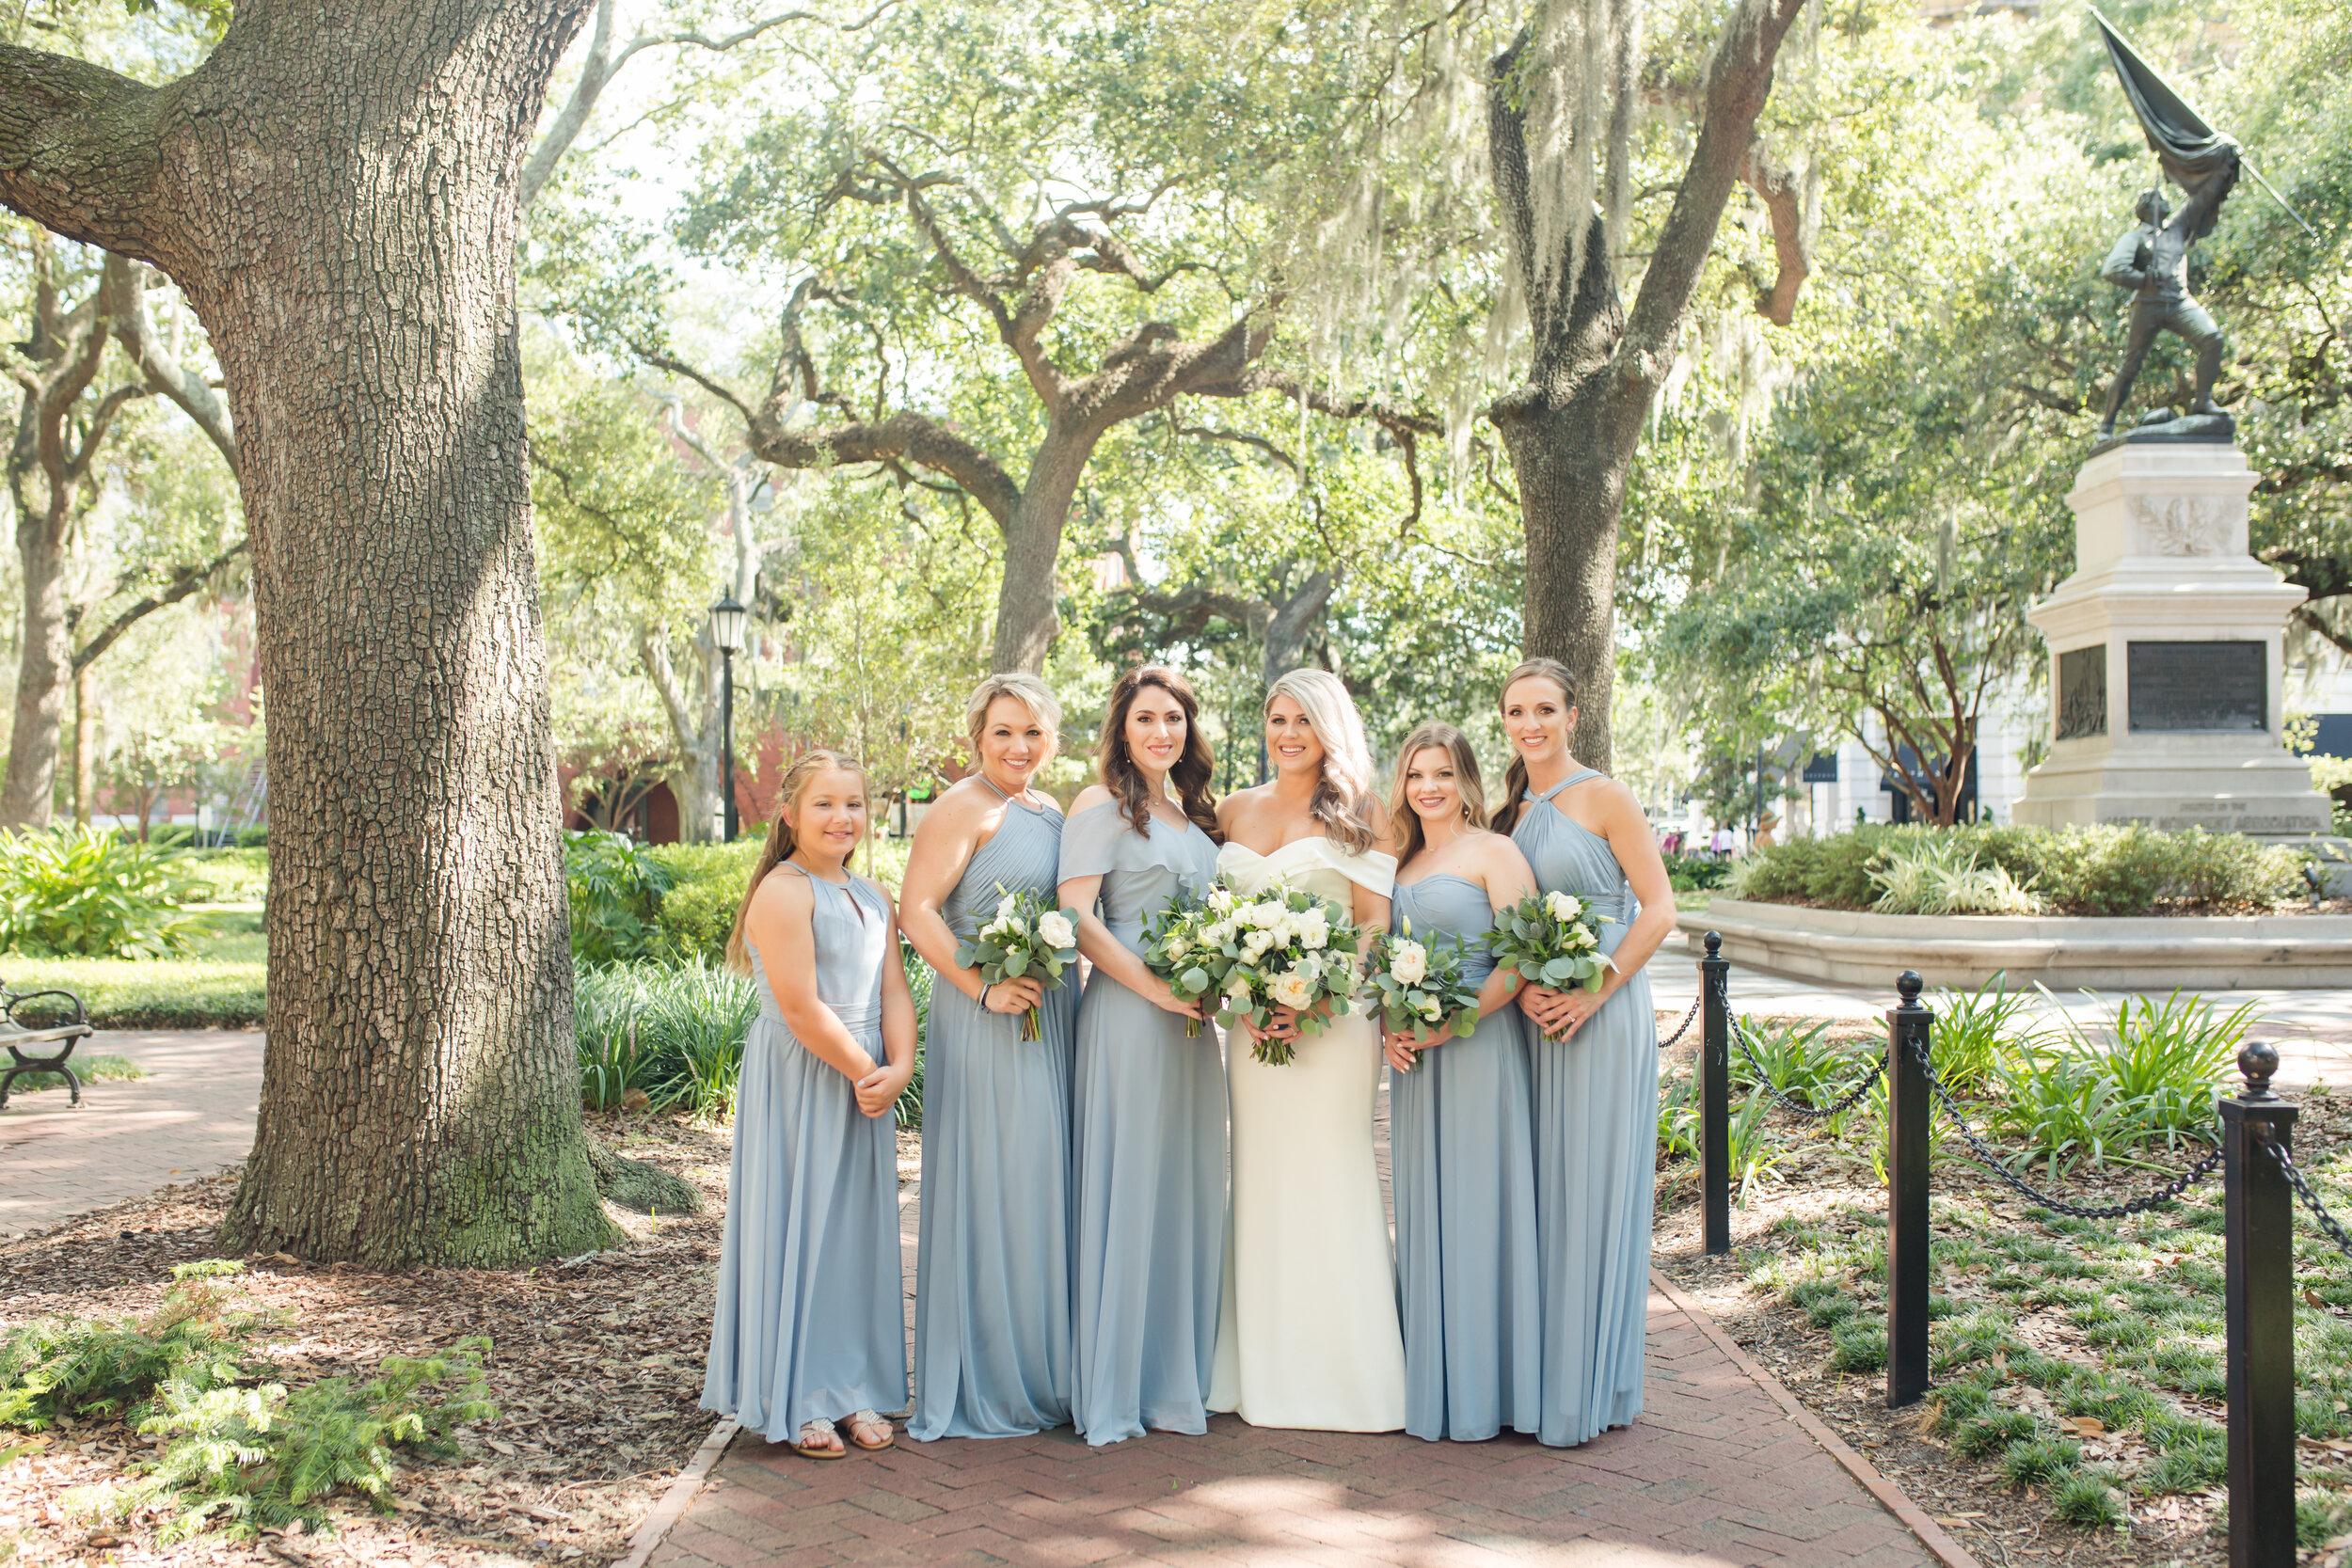 ivory-and-beau-bride-wedding-dresses-bridal-boutique-bridal-shop-savannah-wedding-shop-DGP_SohoSouthCafe_Swanagin-Mullis-156.JPG